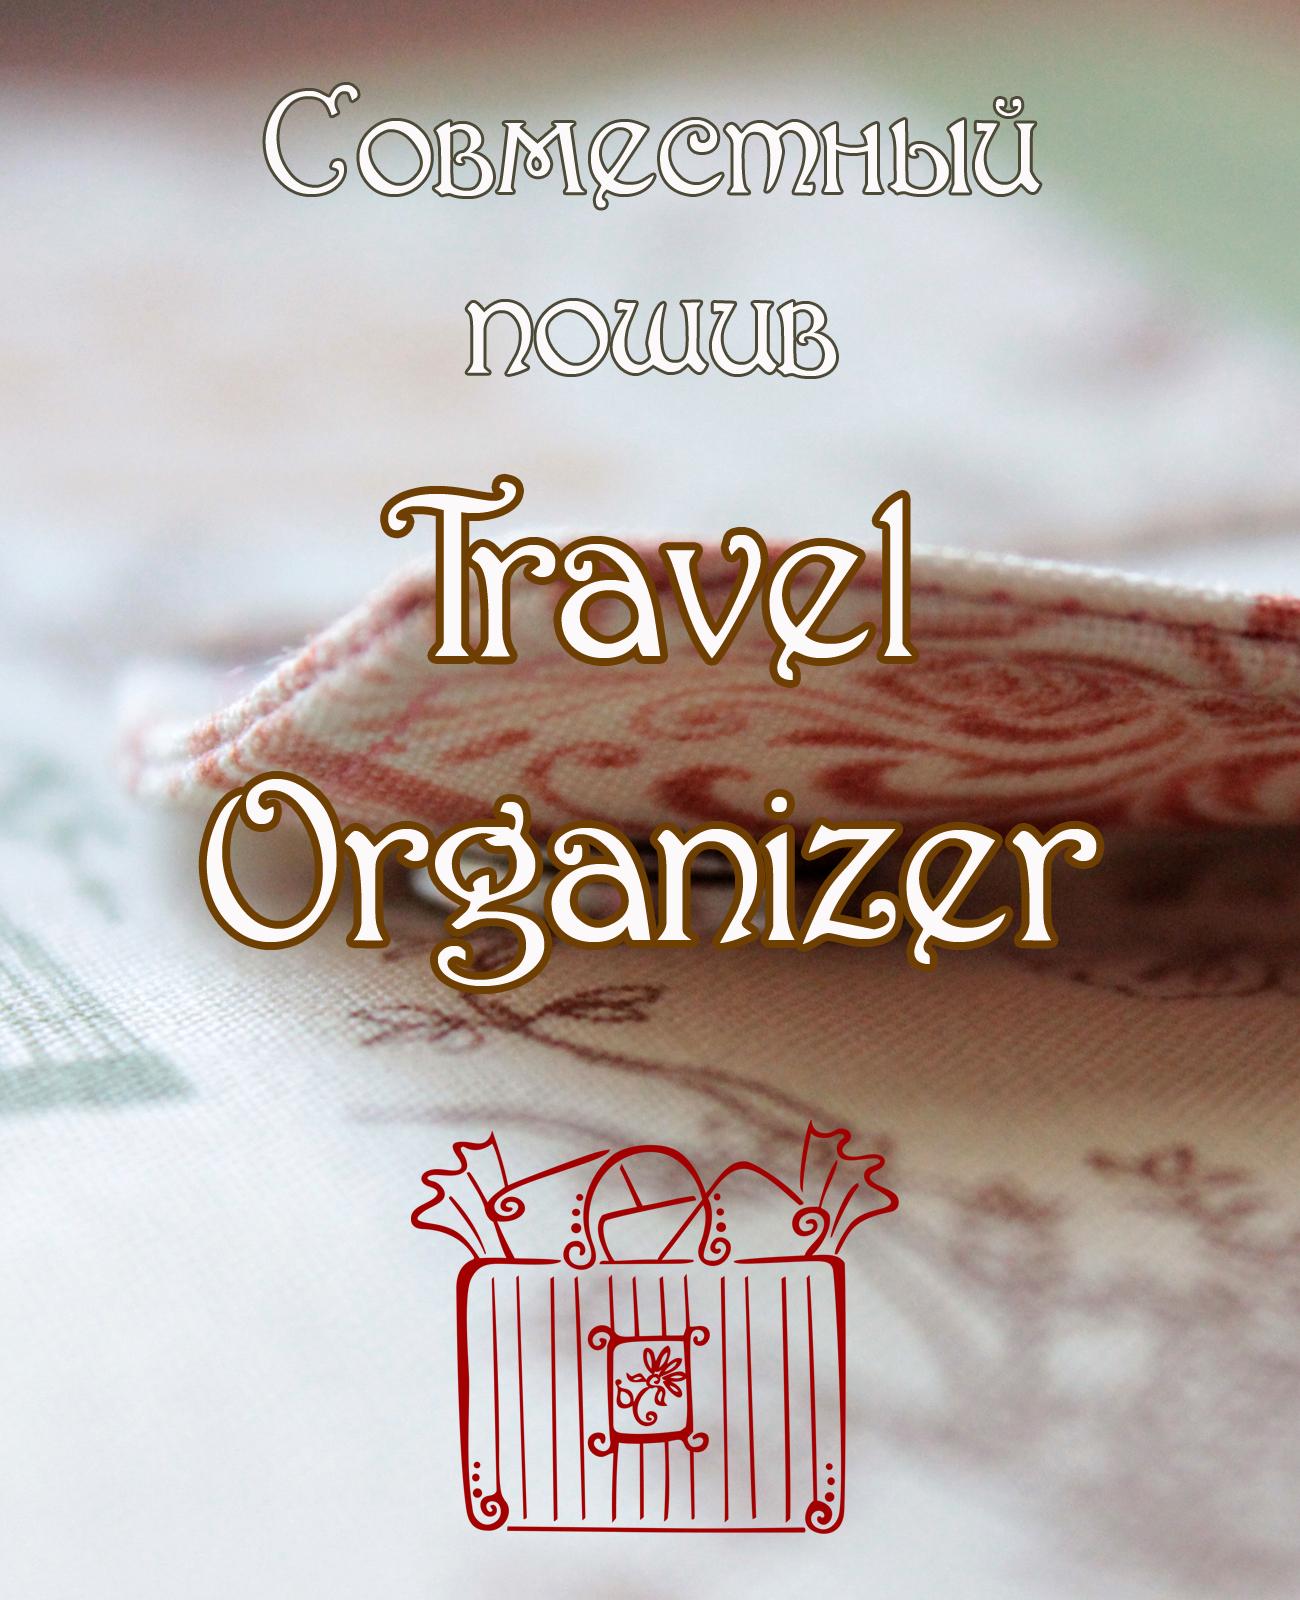 http://mart-hobby.blogspot.ru/2014/07/travel-organizer_22.html?showComment=1406046856840#c1593148766801108120